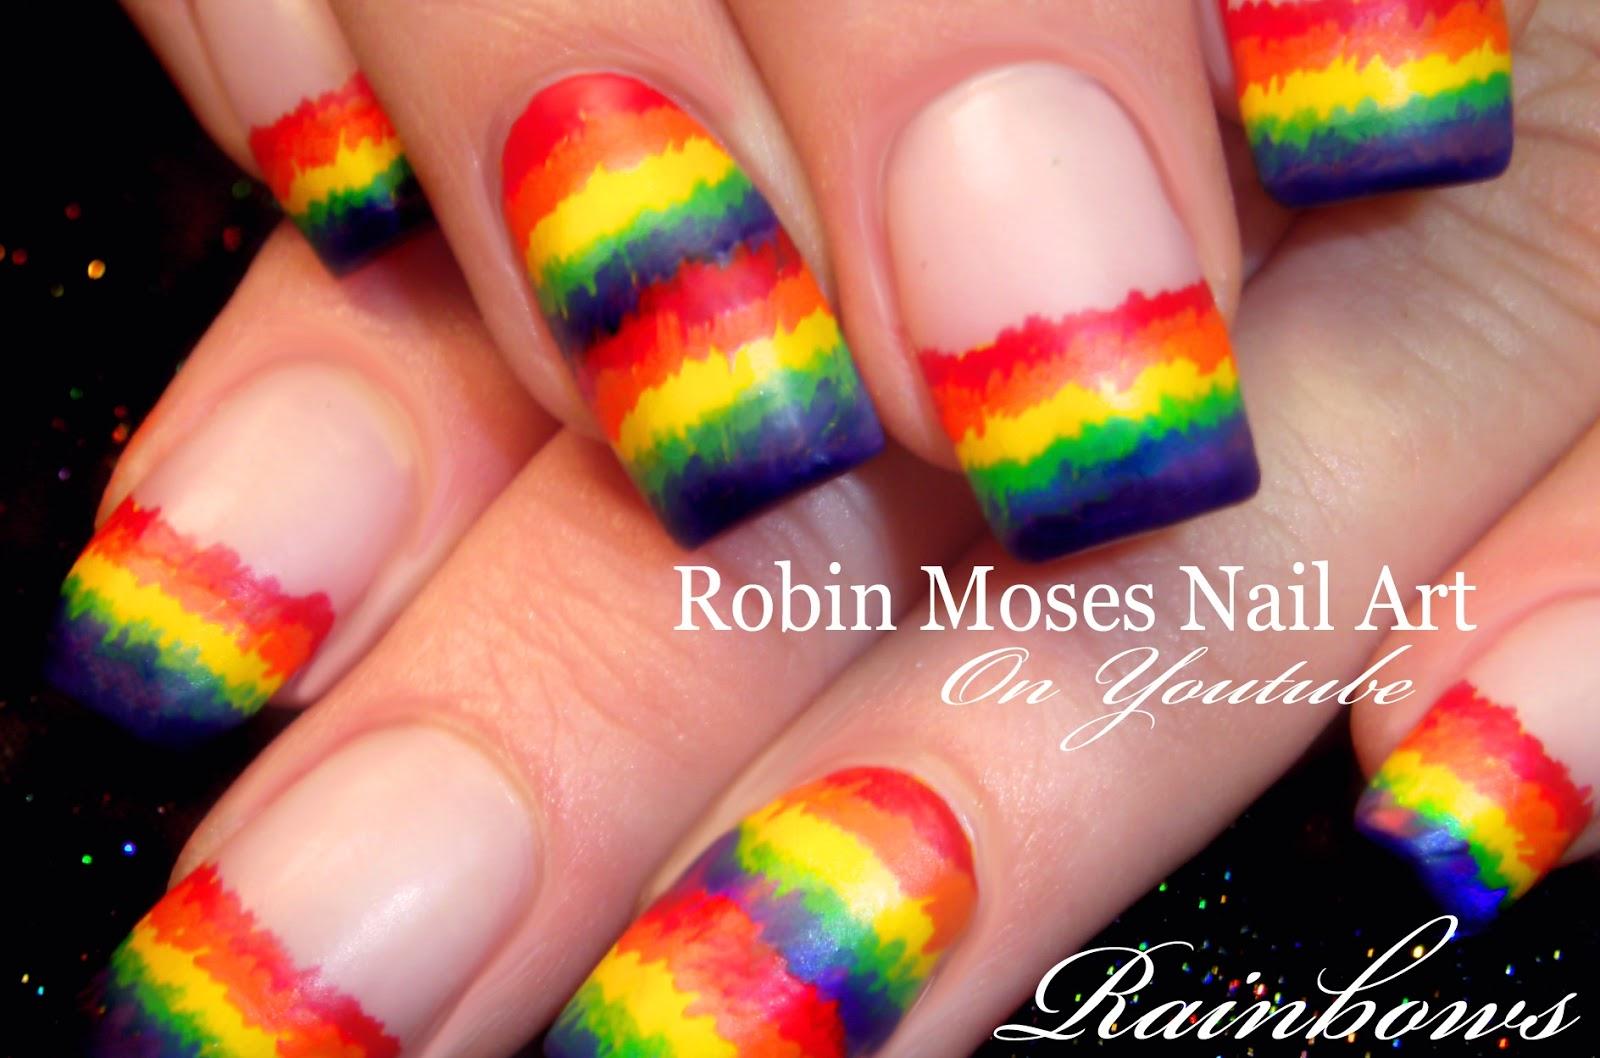 Nail Art By Robin Moses Kocopelli Nails Southwestern Native